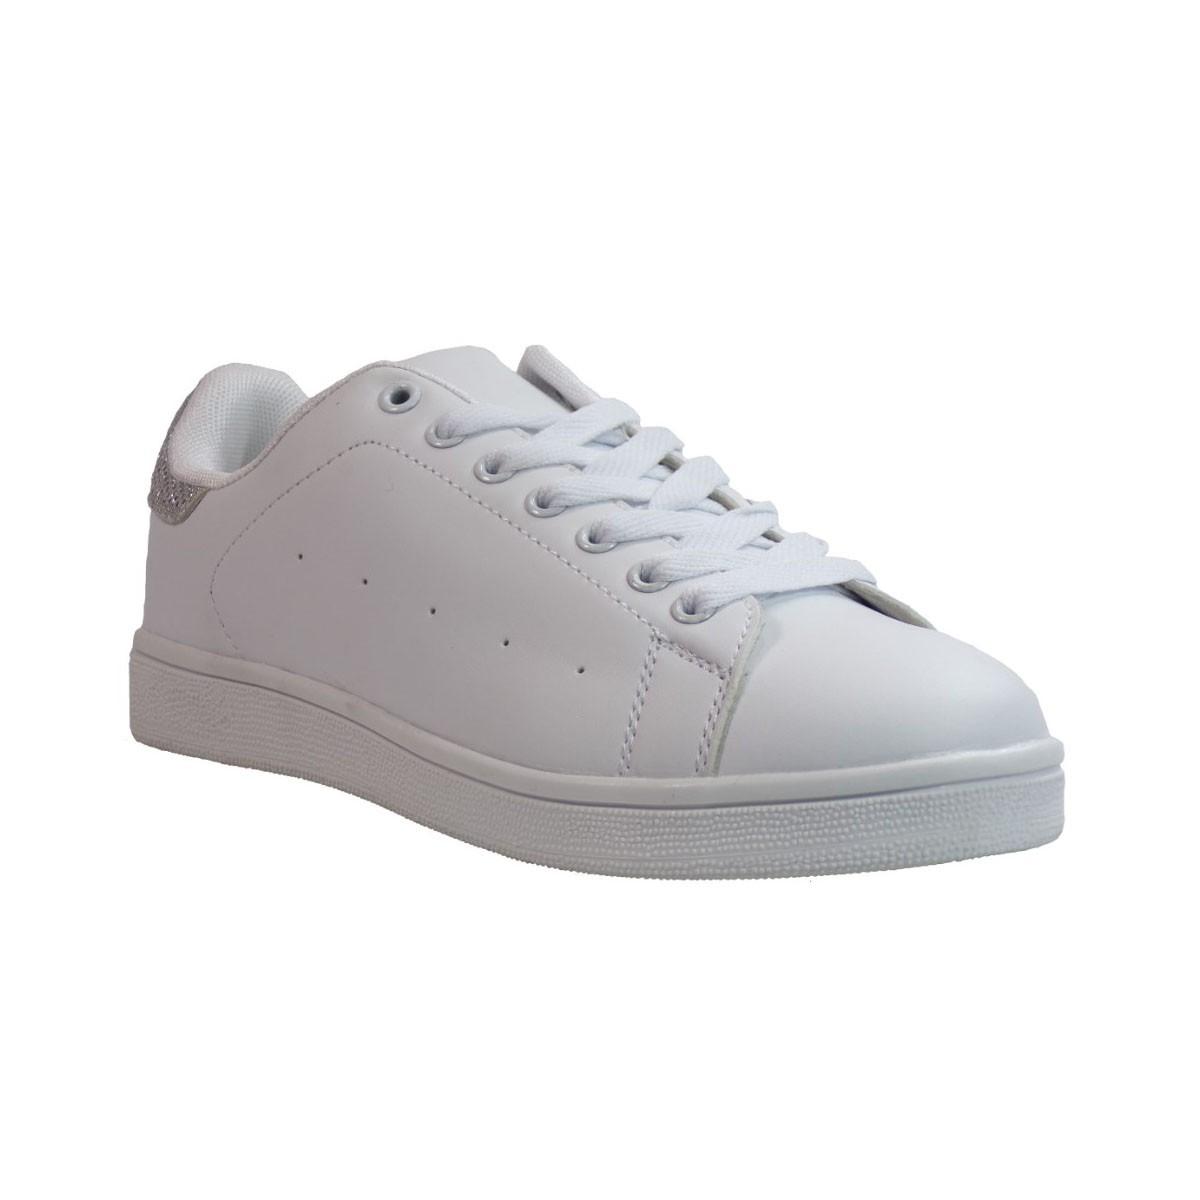 Bagiota shoes Sneakers Παπούτσια Γυναικεία B2588-8 Άσπρο Ασημί Bagiota shoes B2588-8 Άσπρο